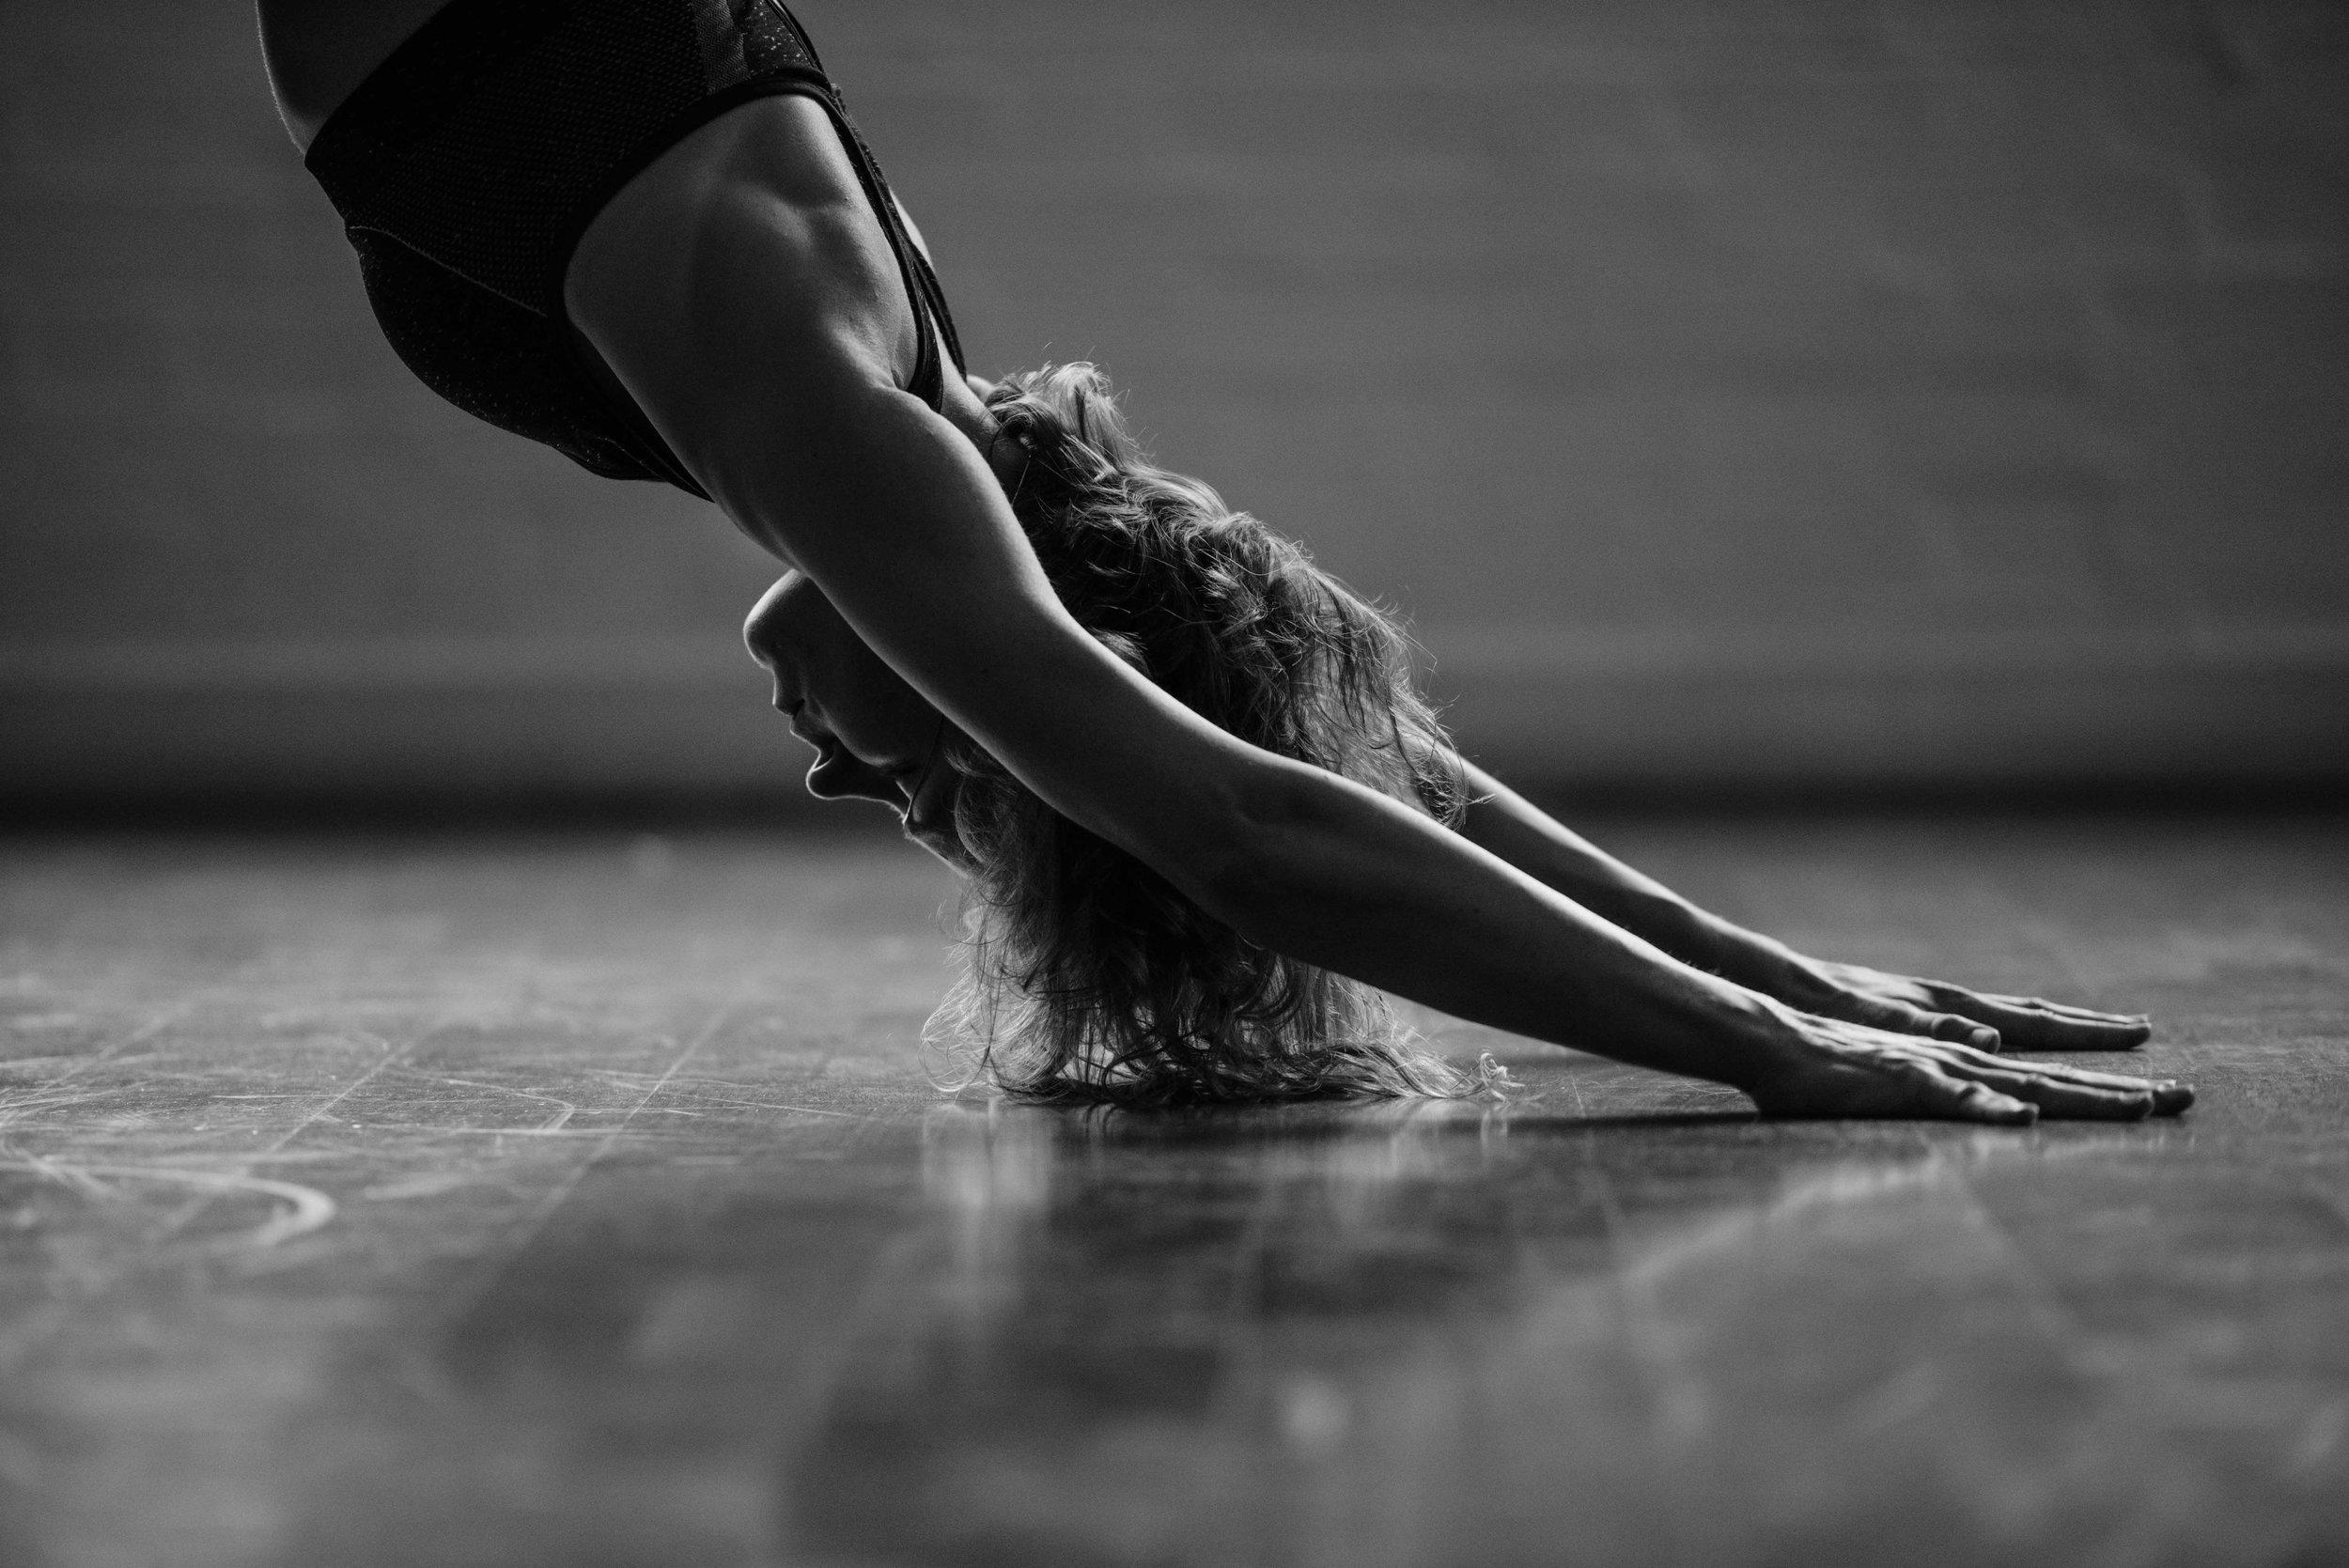 Yoga photographer for Lululemon